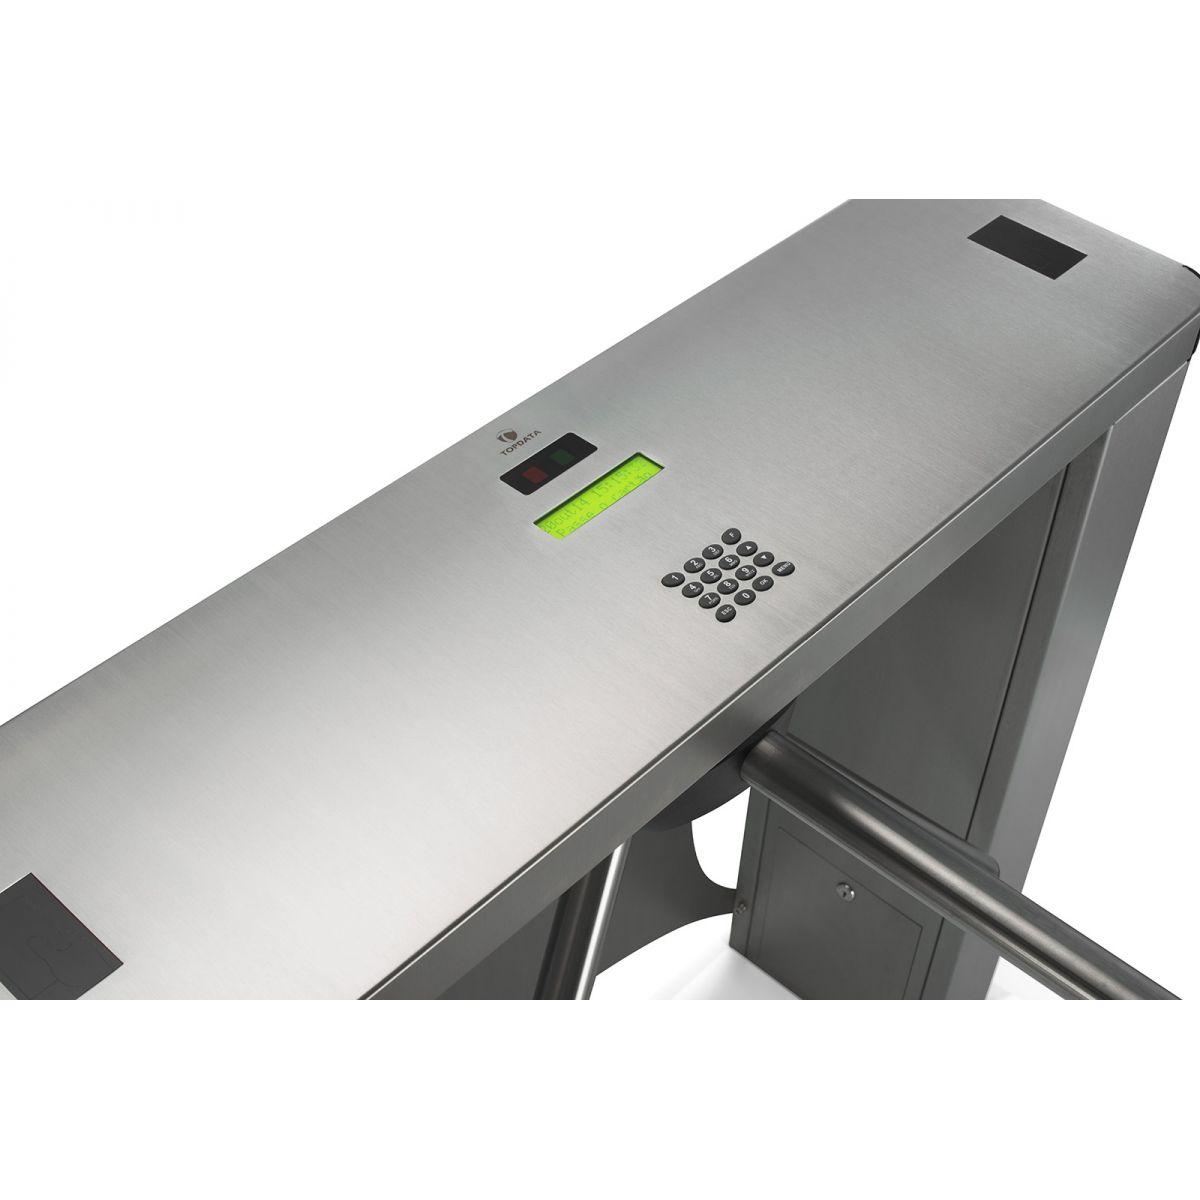 Catraca Box Inox Topdata  - Iponto Tecnologia